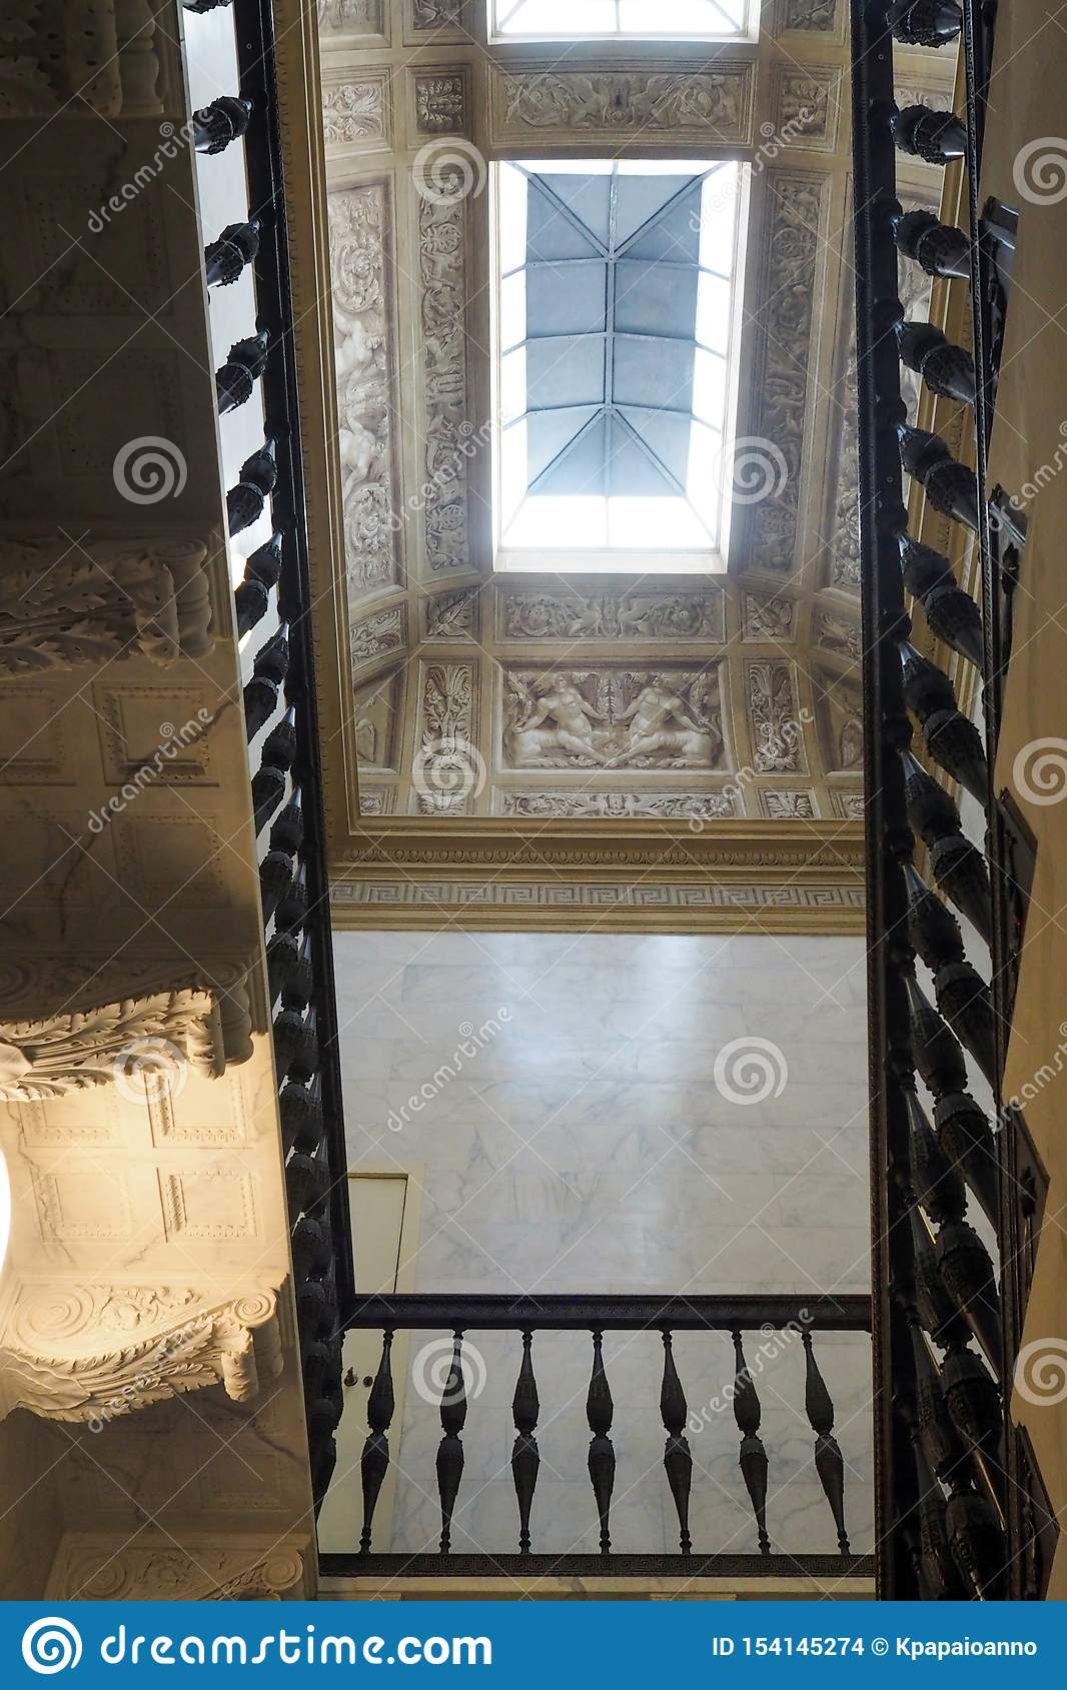 Palais néoclassique de villa Torlonia à Rome, Italie